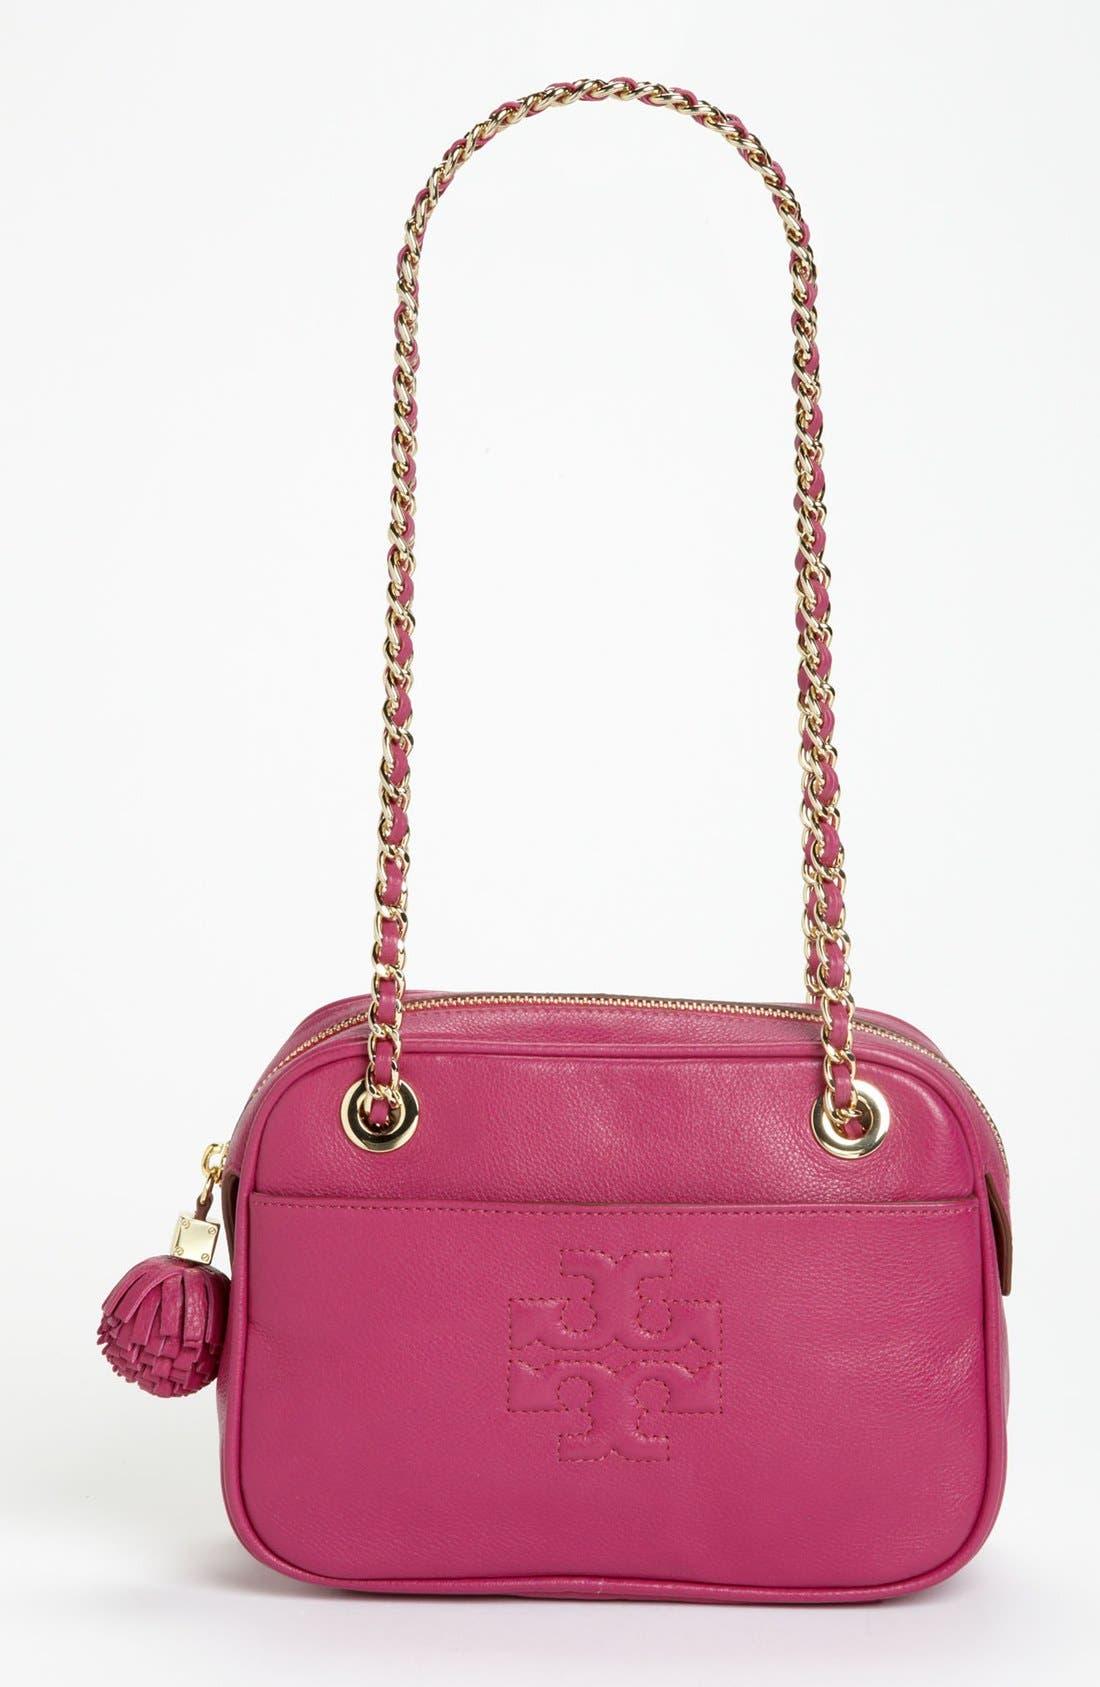 Main Image - Tory Burch 'Thea' Leather Crossbody Bag